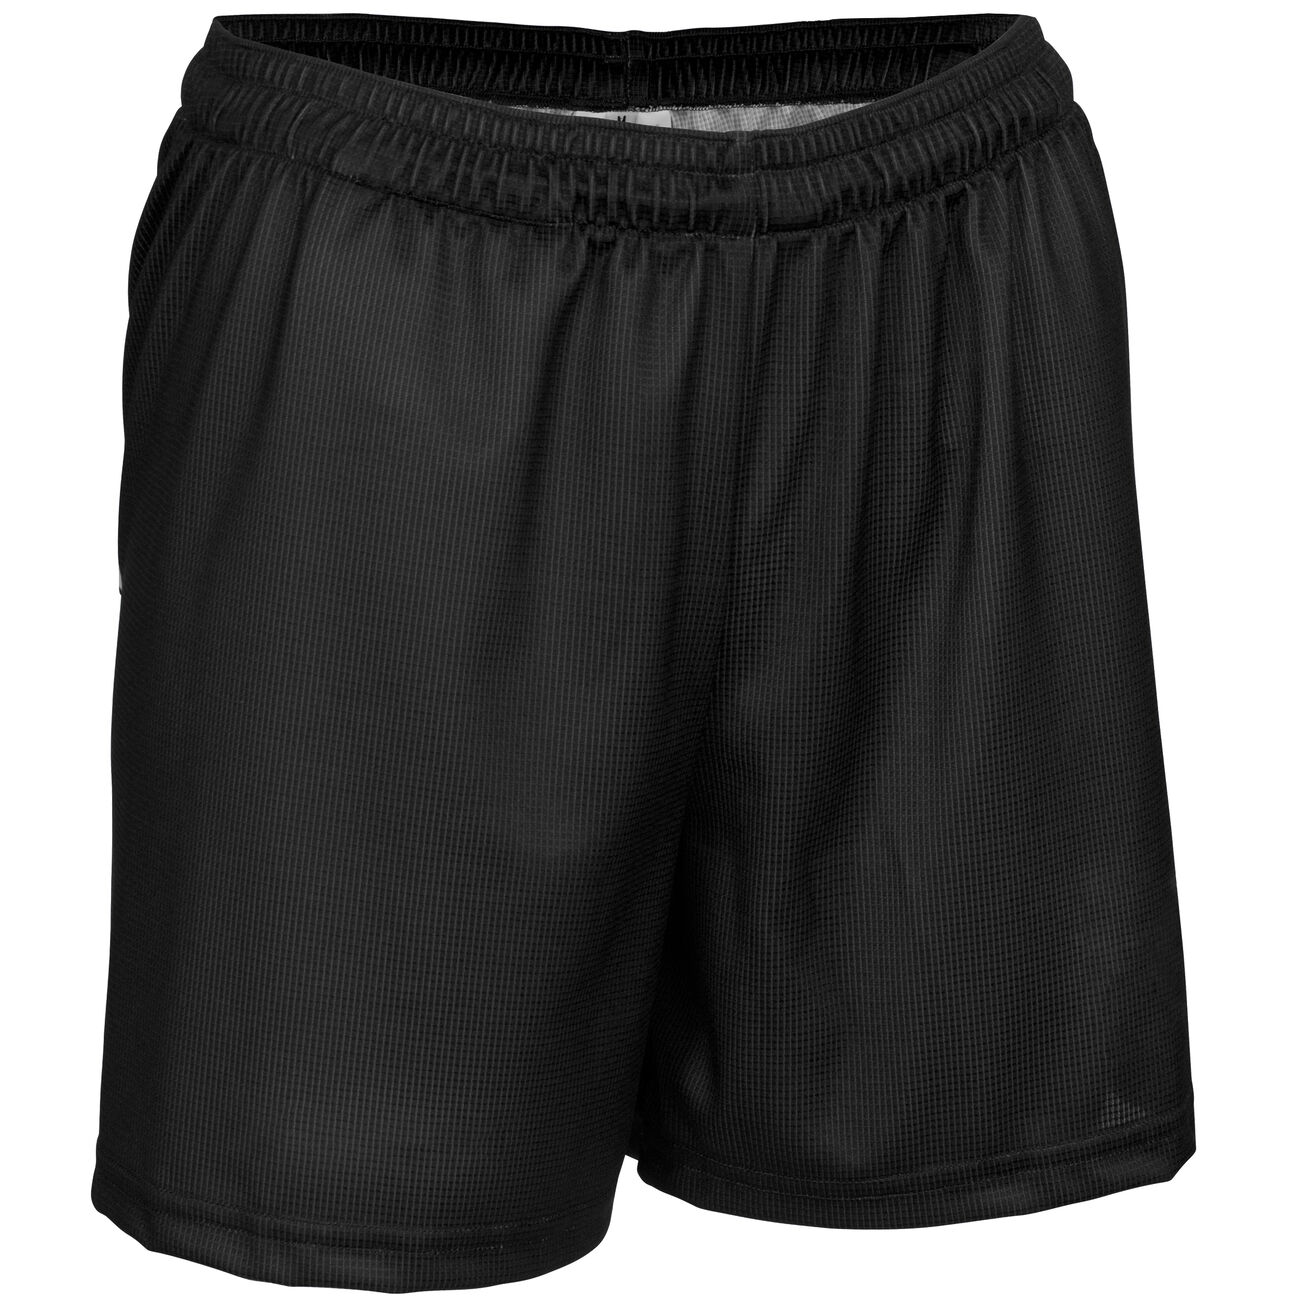 Spark shorts women`s